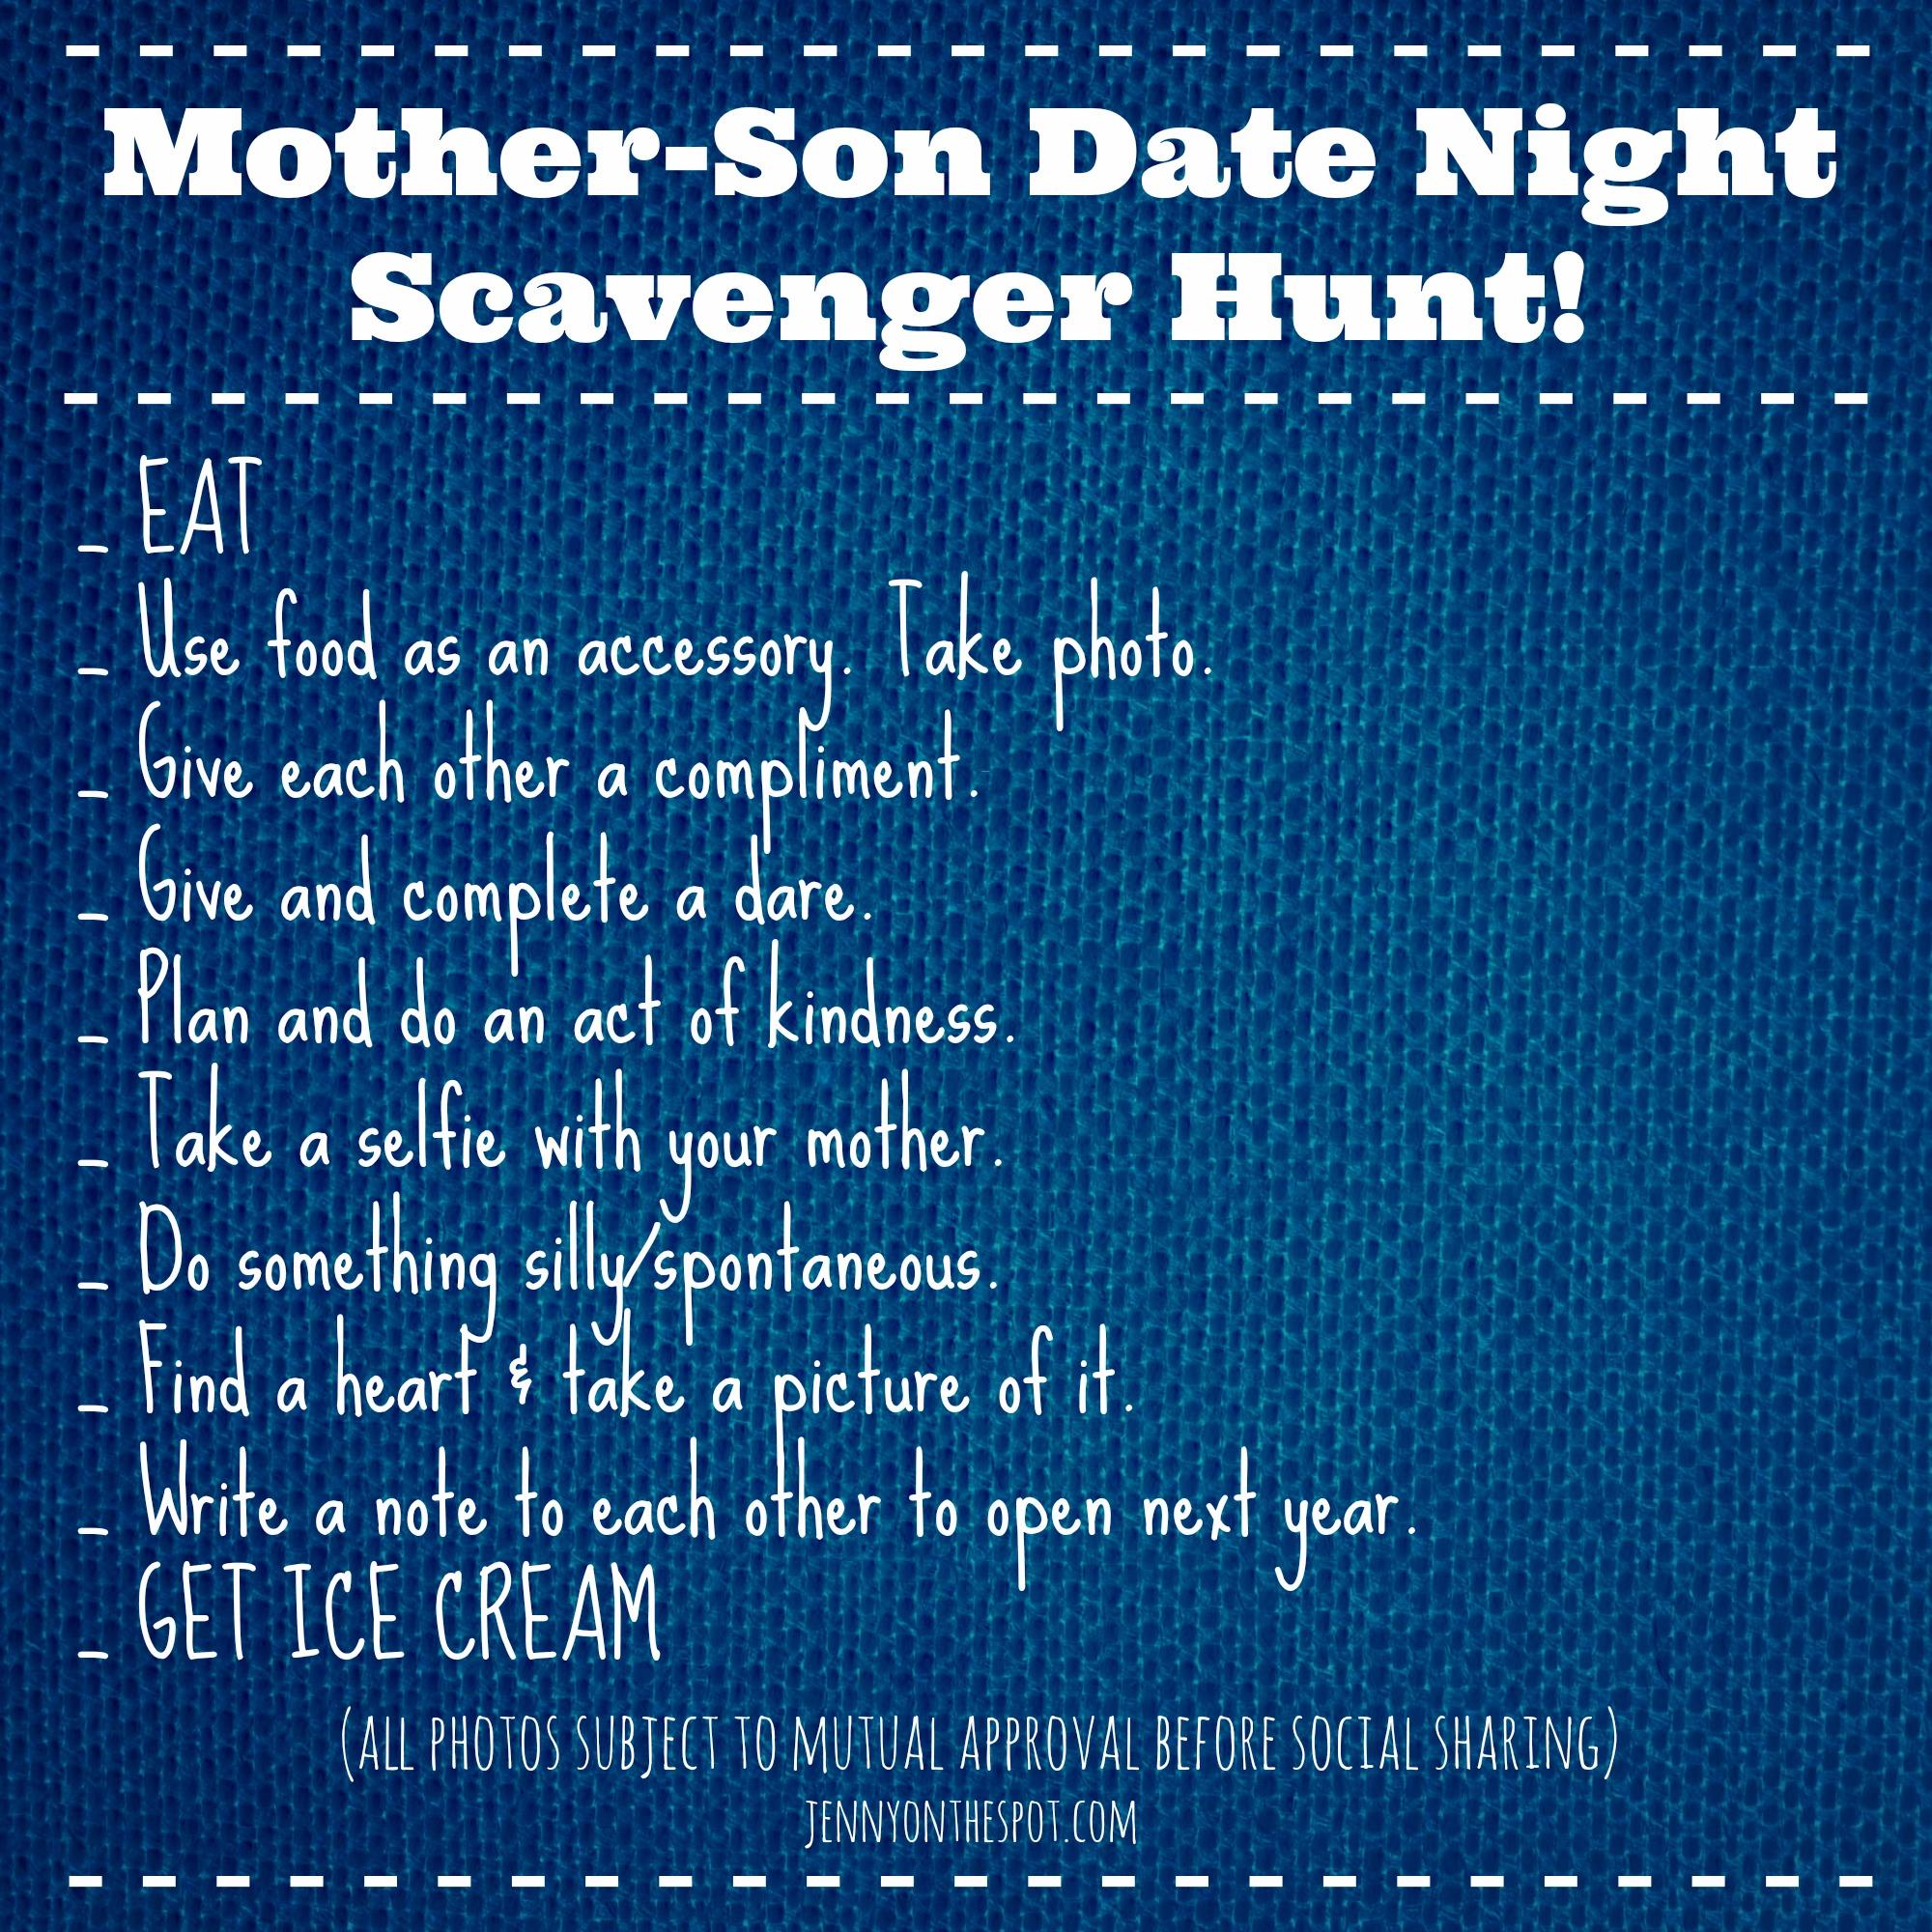 Dating scavenger hunt